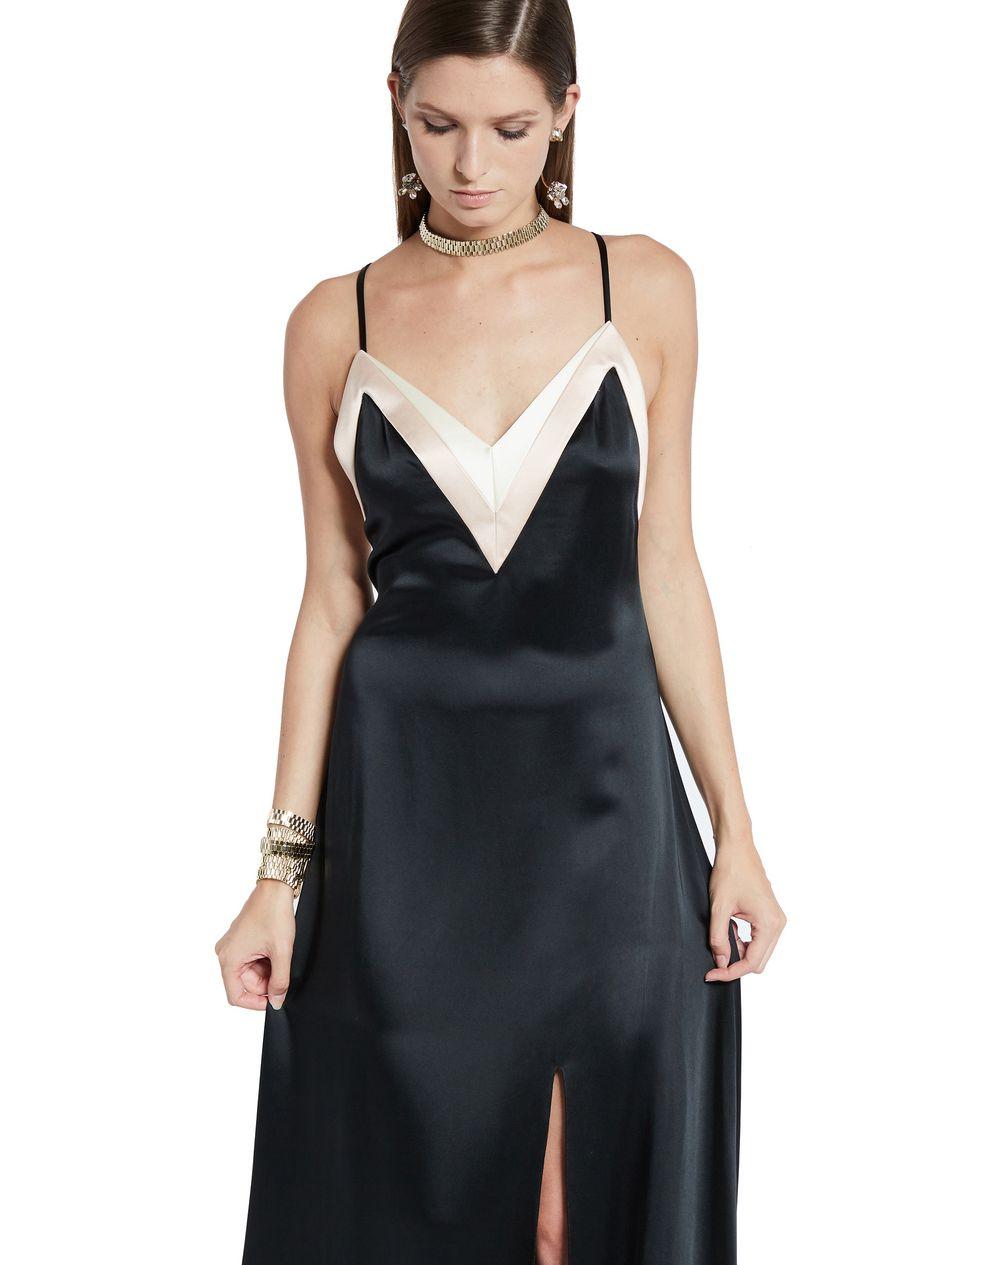 LONG SATIN DRESS - Lanvin